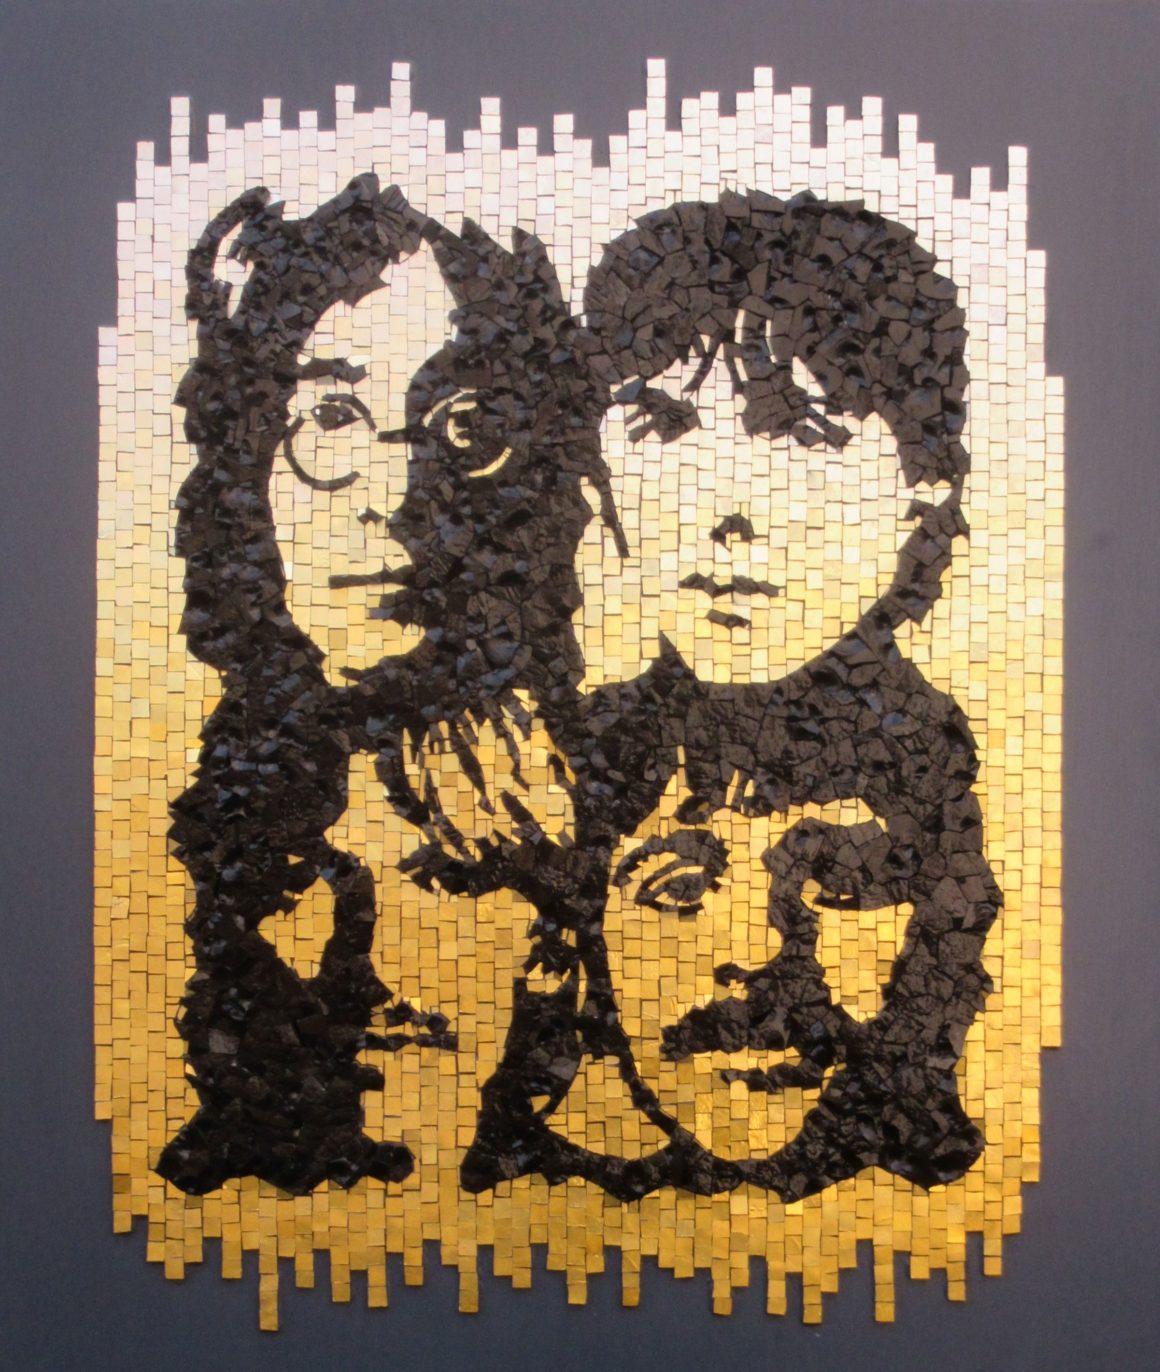 The Beatles -Mosaic by Colorito- Mozaïekatelier Colorito-Natasja Mulder